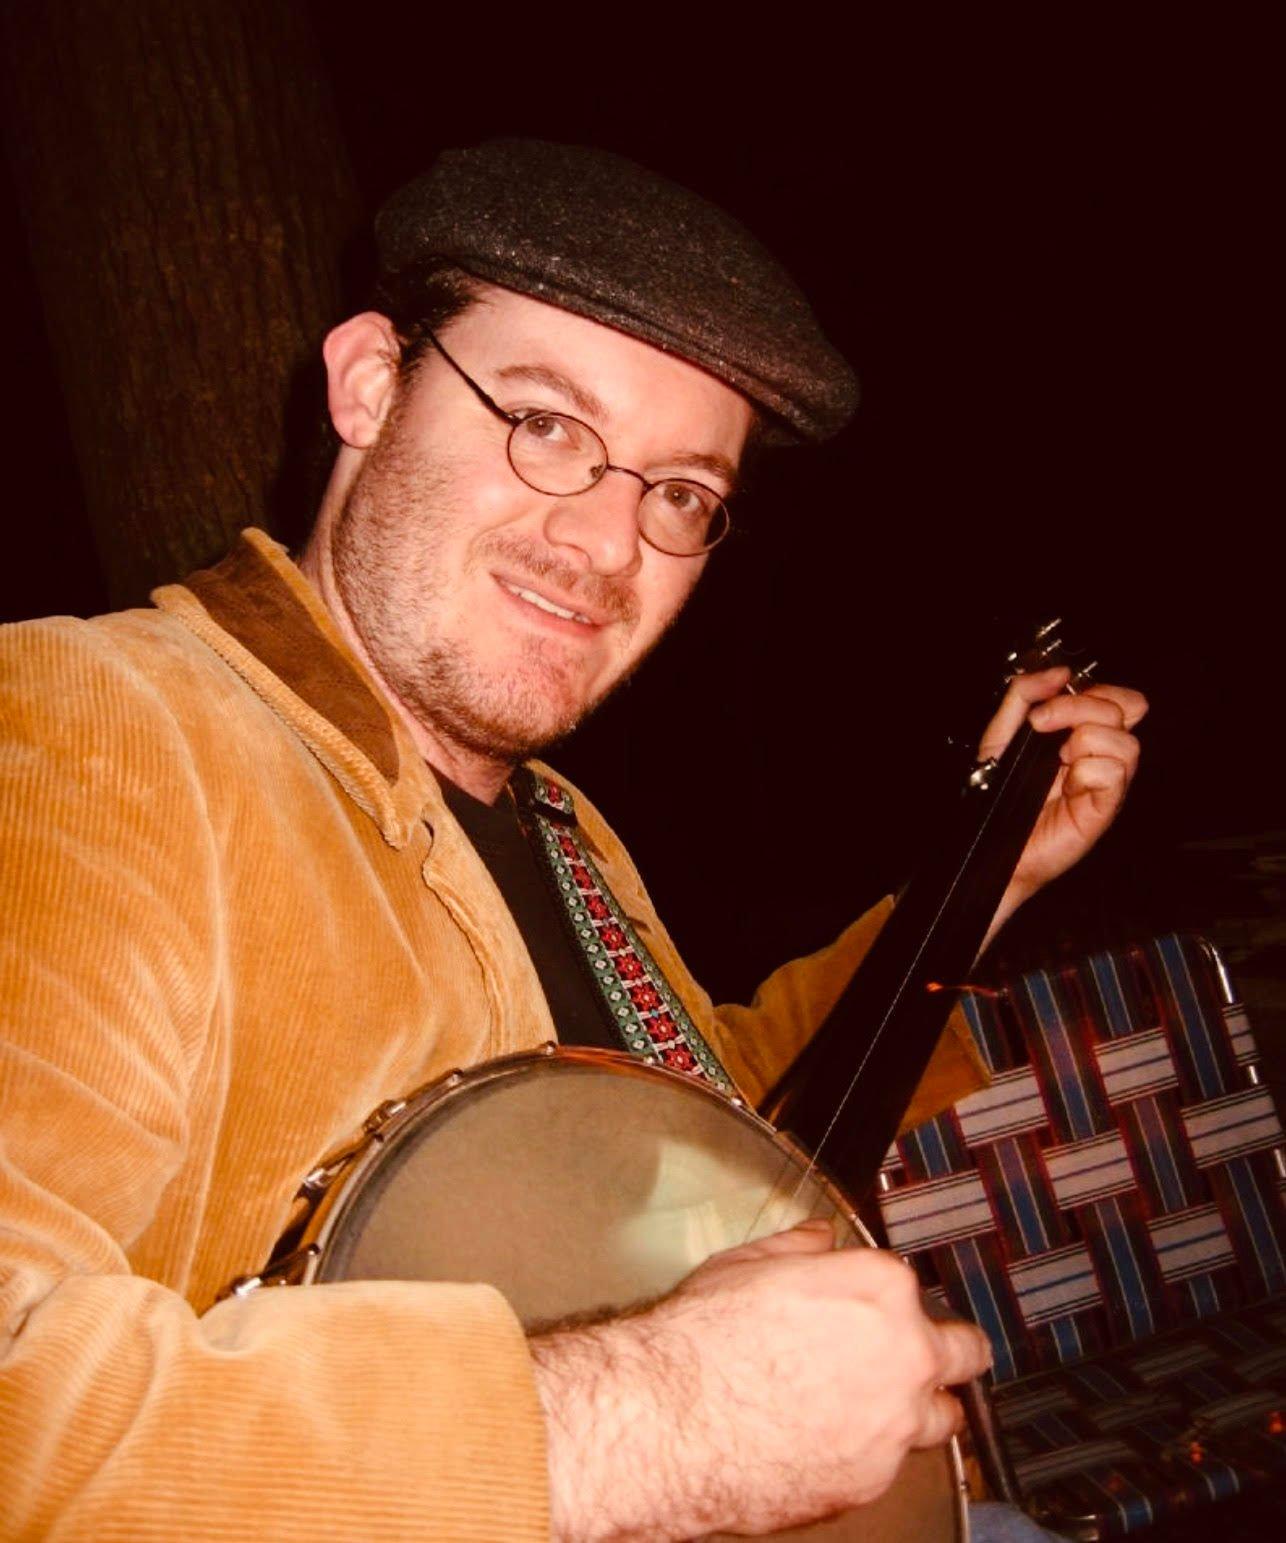 Chad Jones plays the banjo